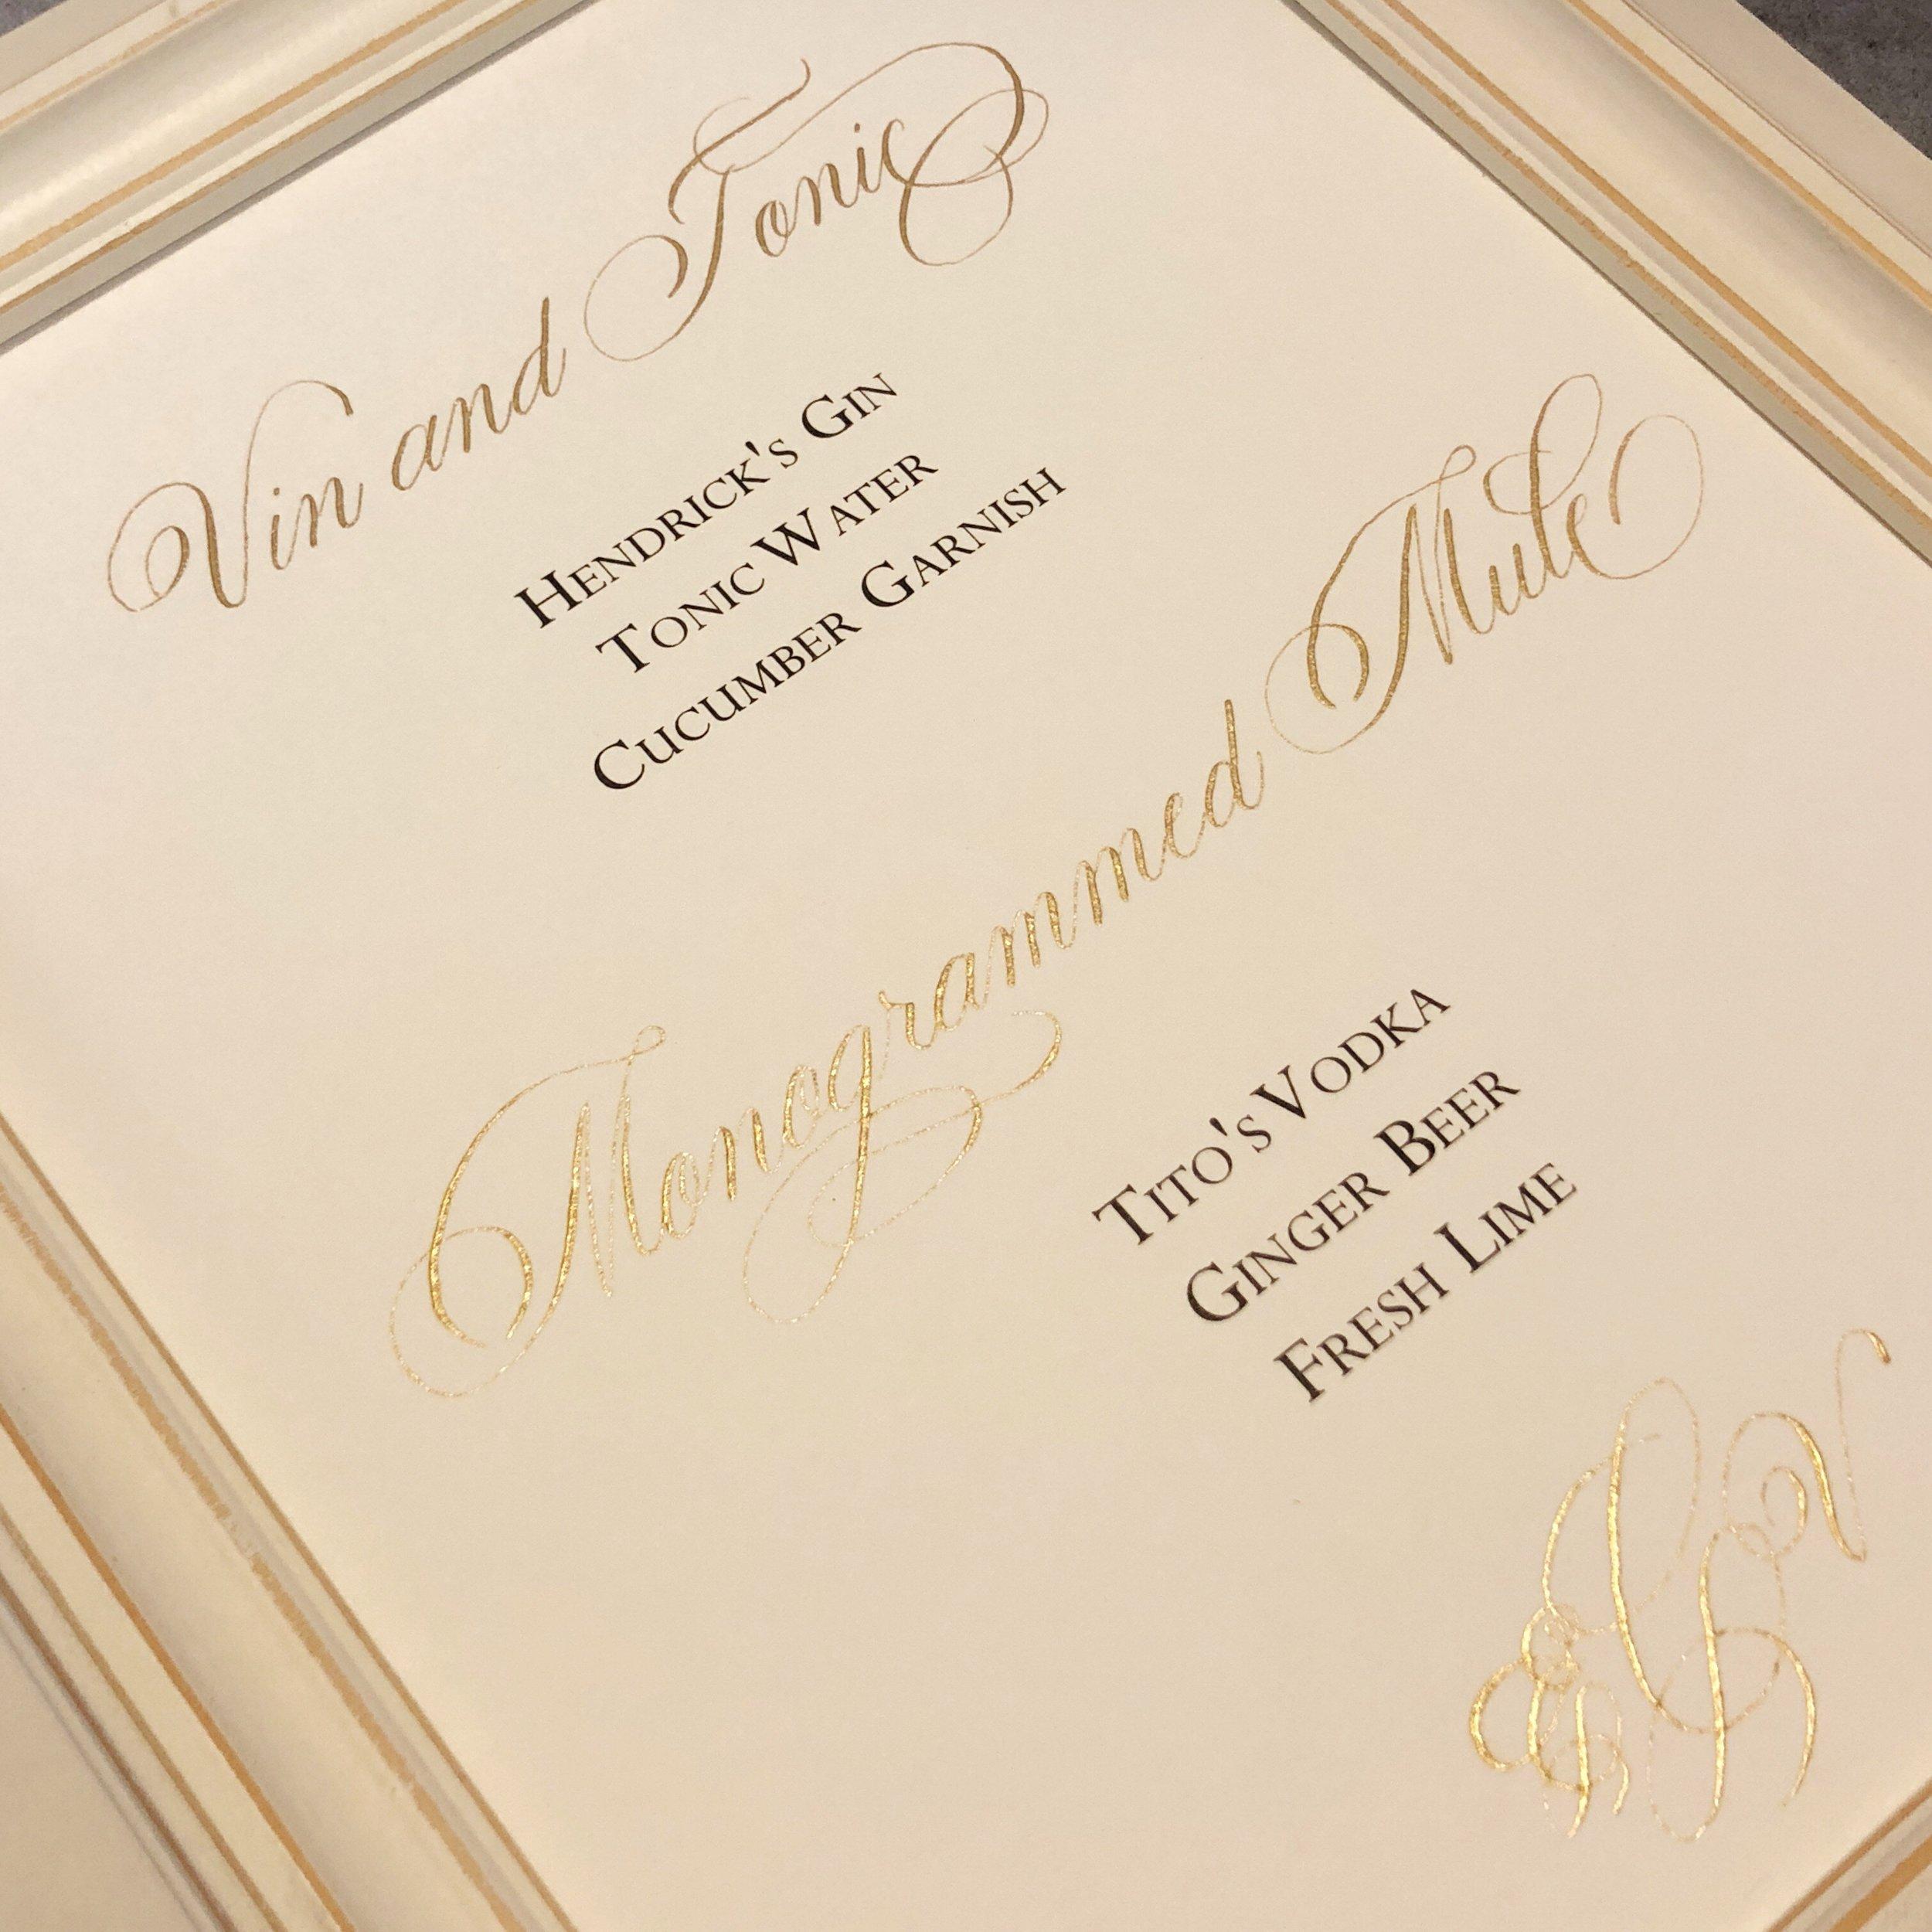 Central PA, York PA, JesSmith Designs, custom, wedding, invitations, bridal, Harrisburg, hanover, calligraphy, baltimore, wedding invitations, lancaster, gettysburg, 08-24 15.11.06.jpg